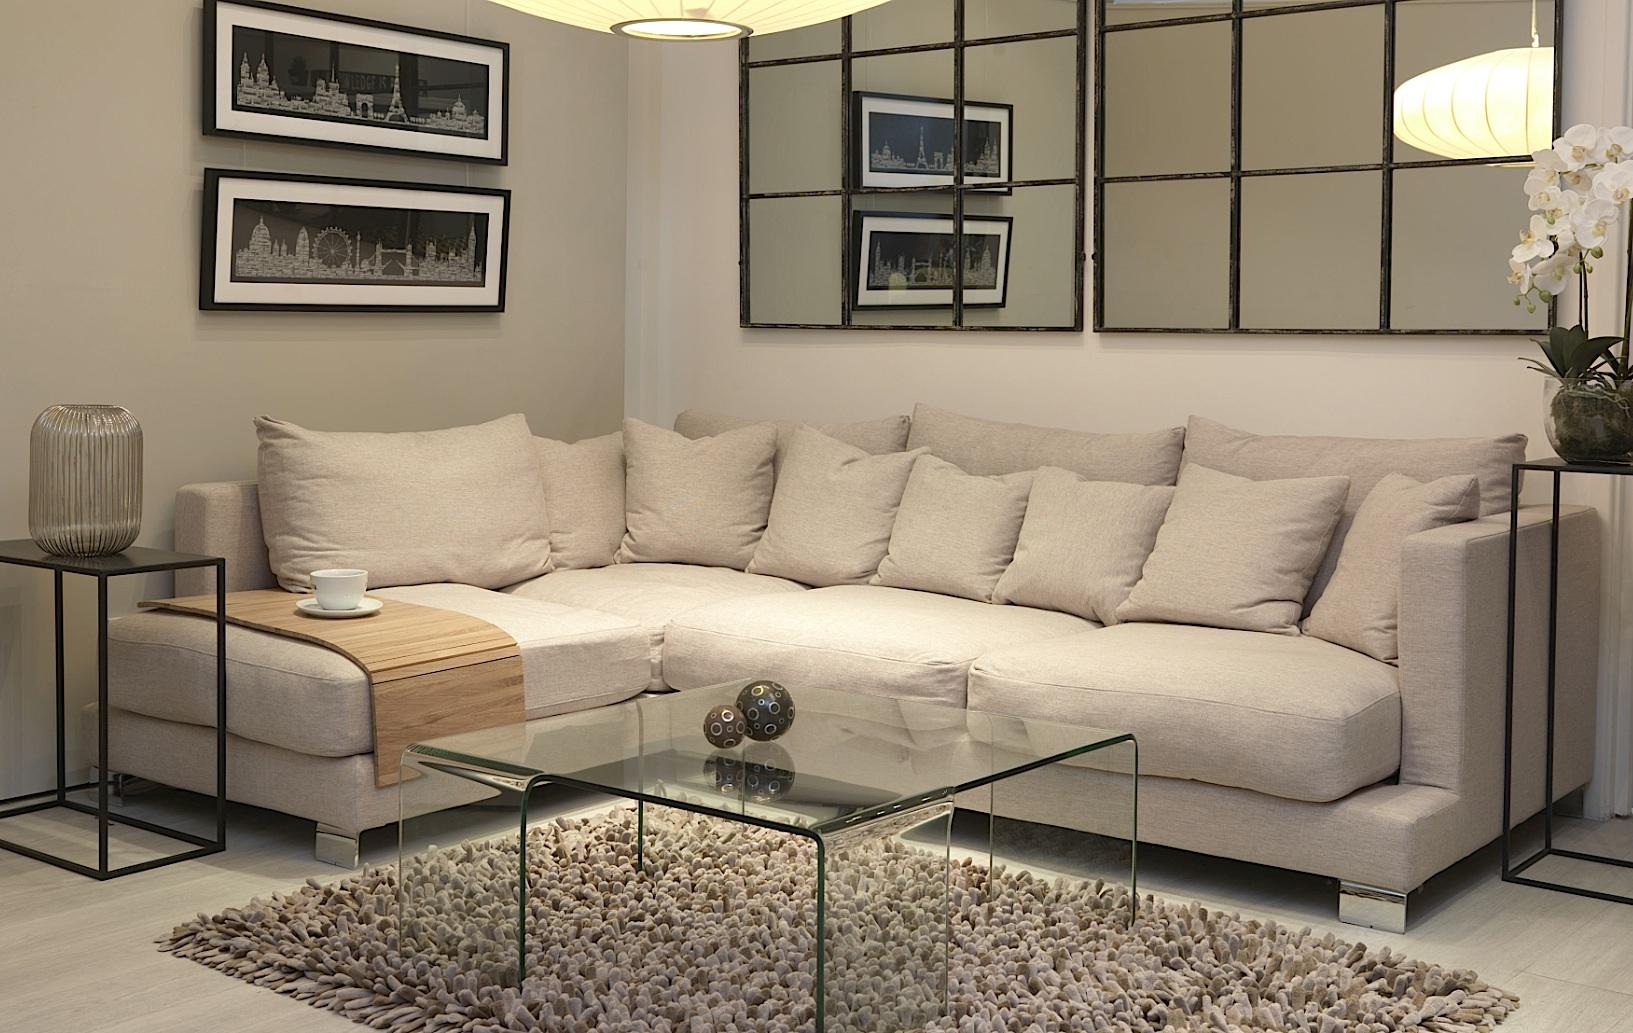 Ravello 3 Seater Sofa Divan-30139